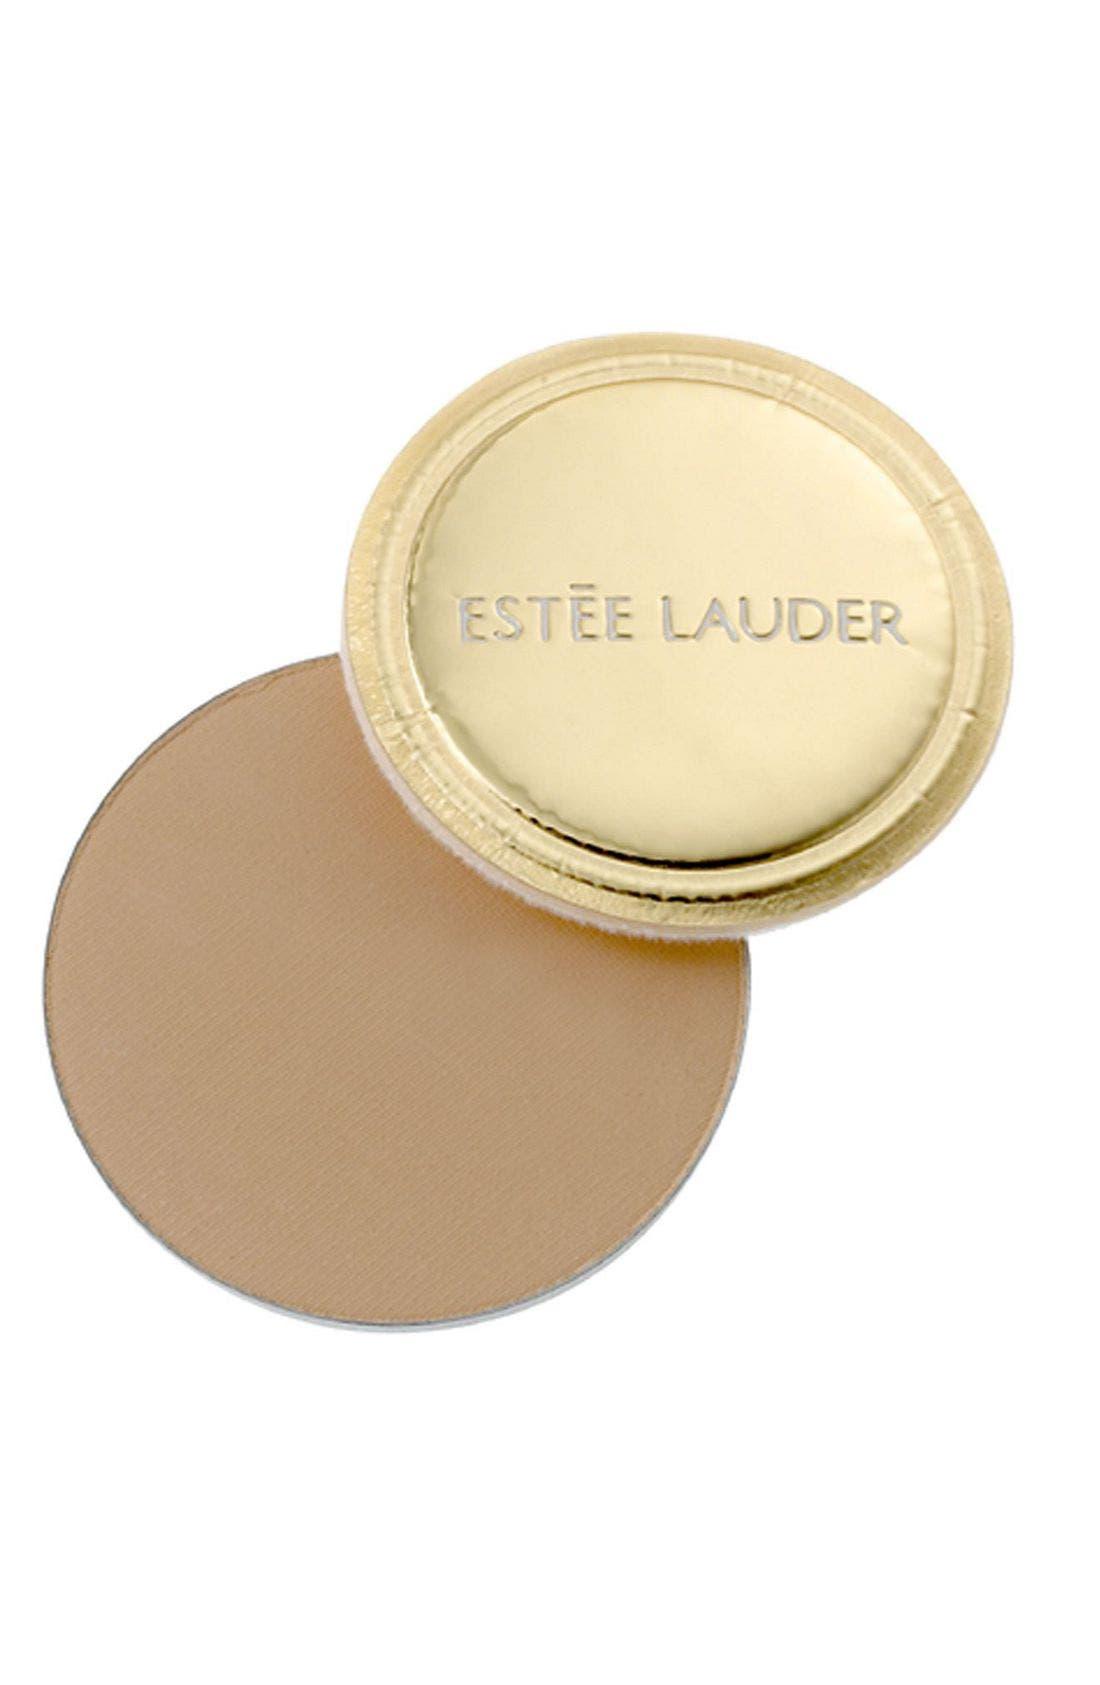 Main Image - Estée Lauder 'After Hours' Lucidity Pressed Powder Refill